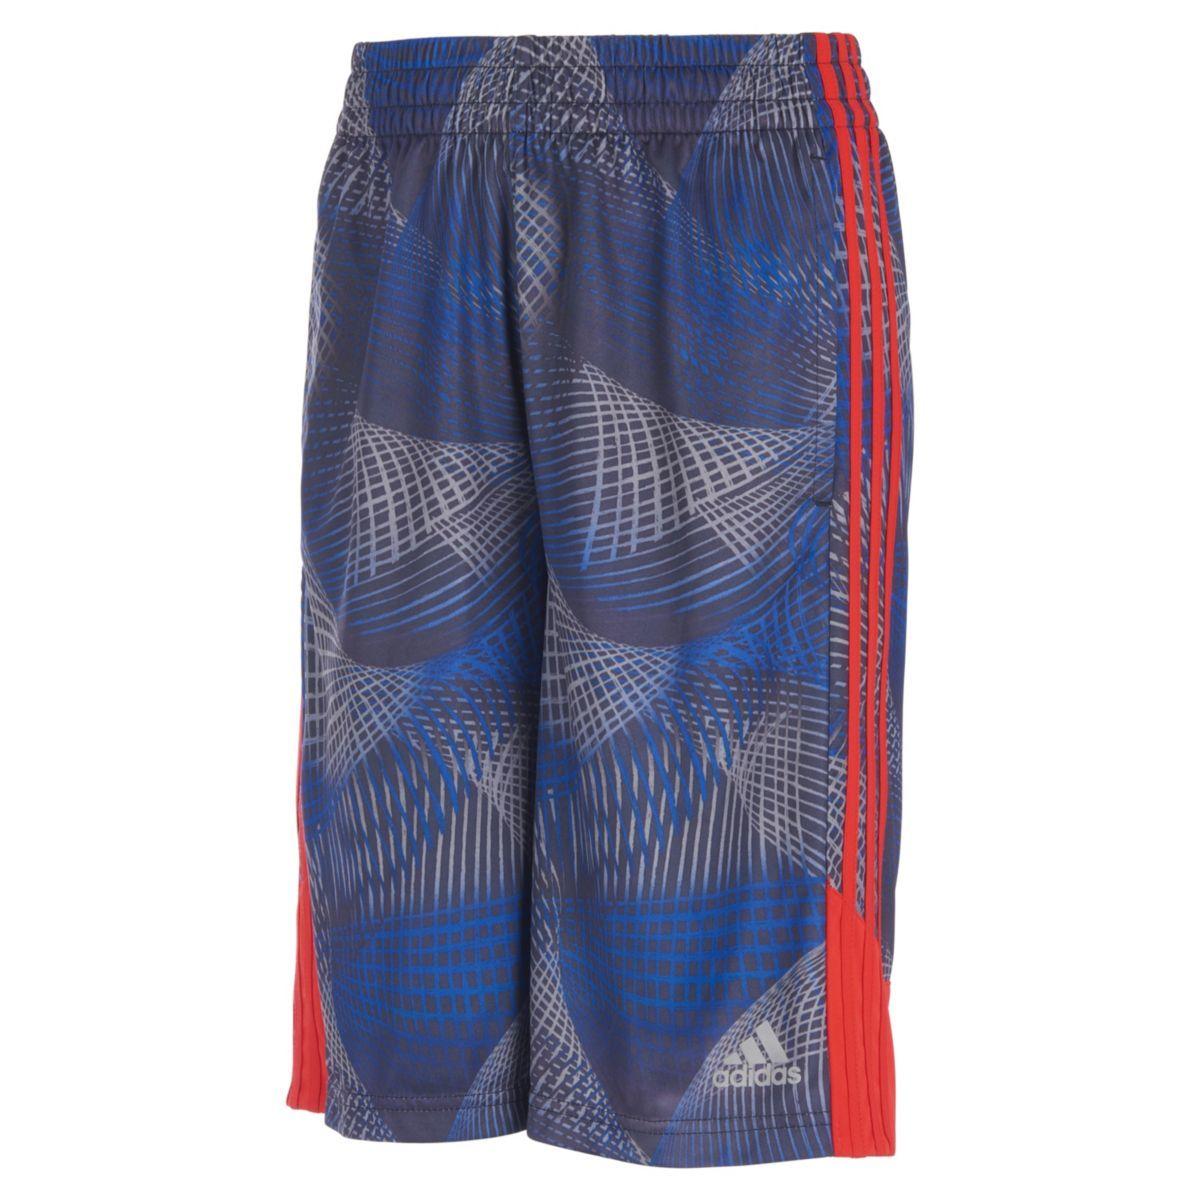 Adidas Little Boys' Amplified Net Basketball Shorts - Blue, 6